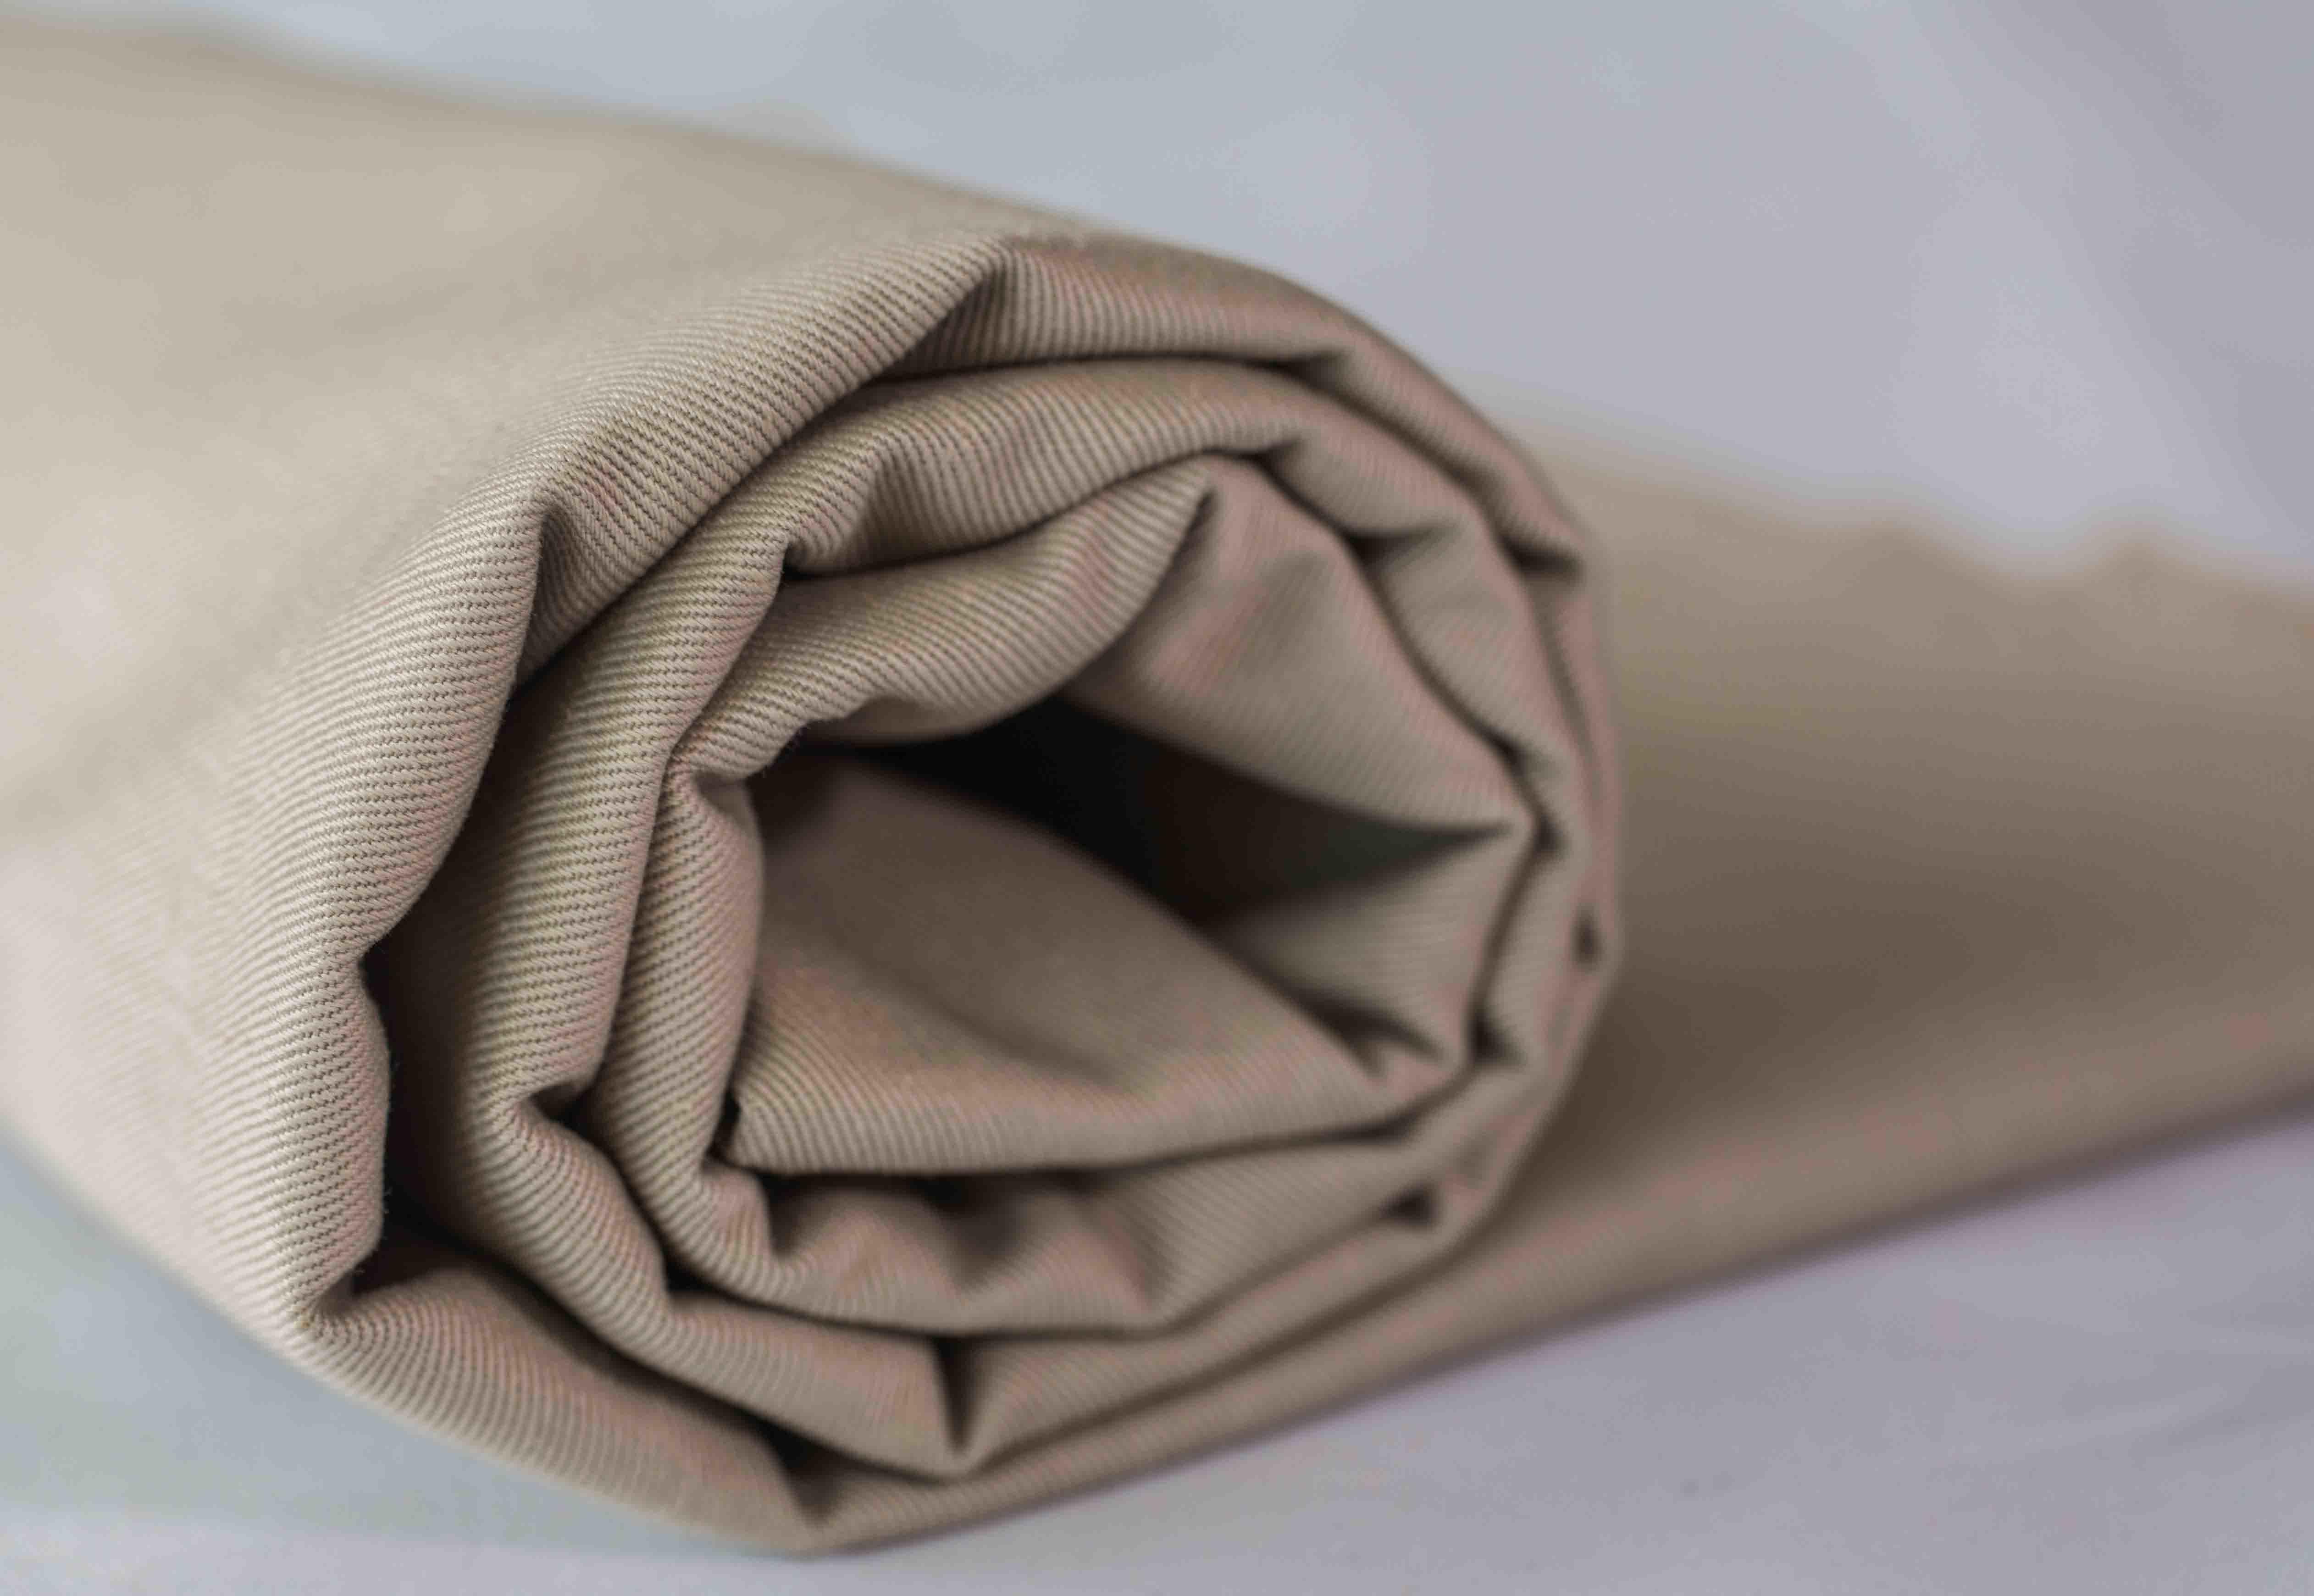 Cotton Polyester Uniform Shirt Garment Dyed White Twill Plain Fabric